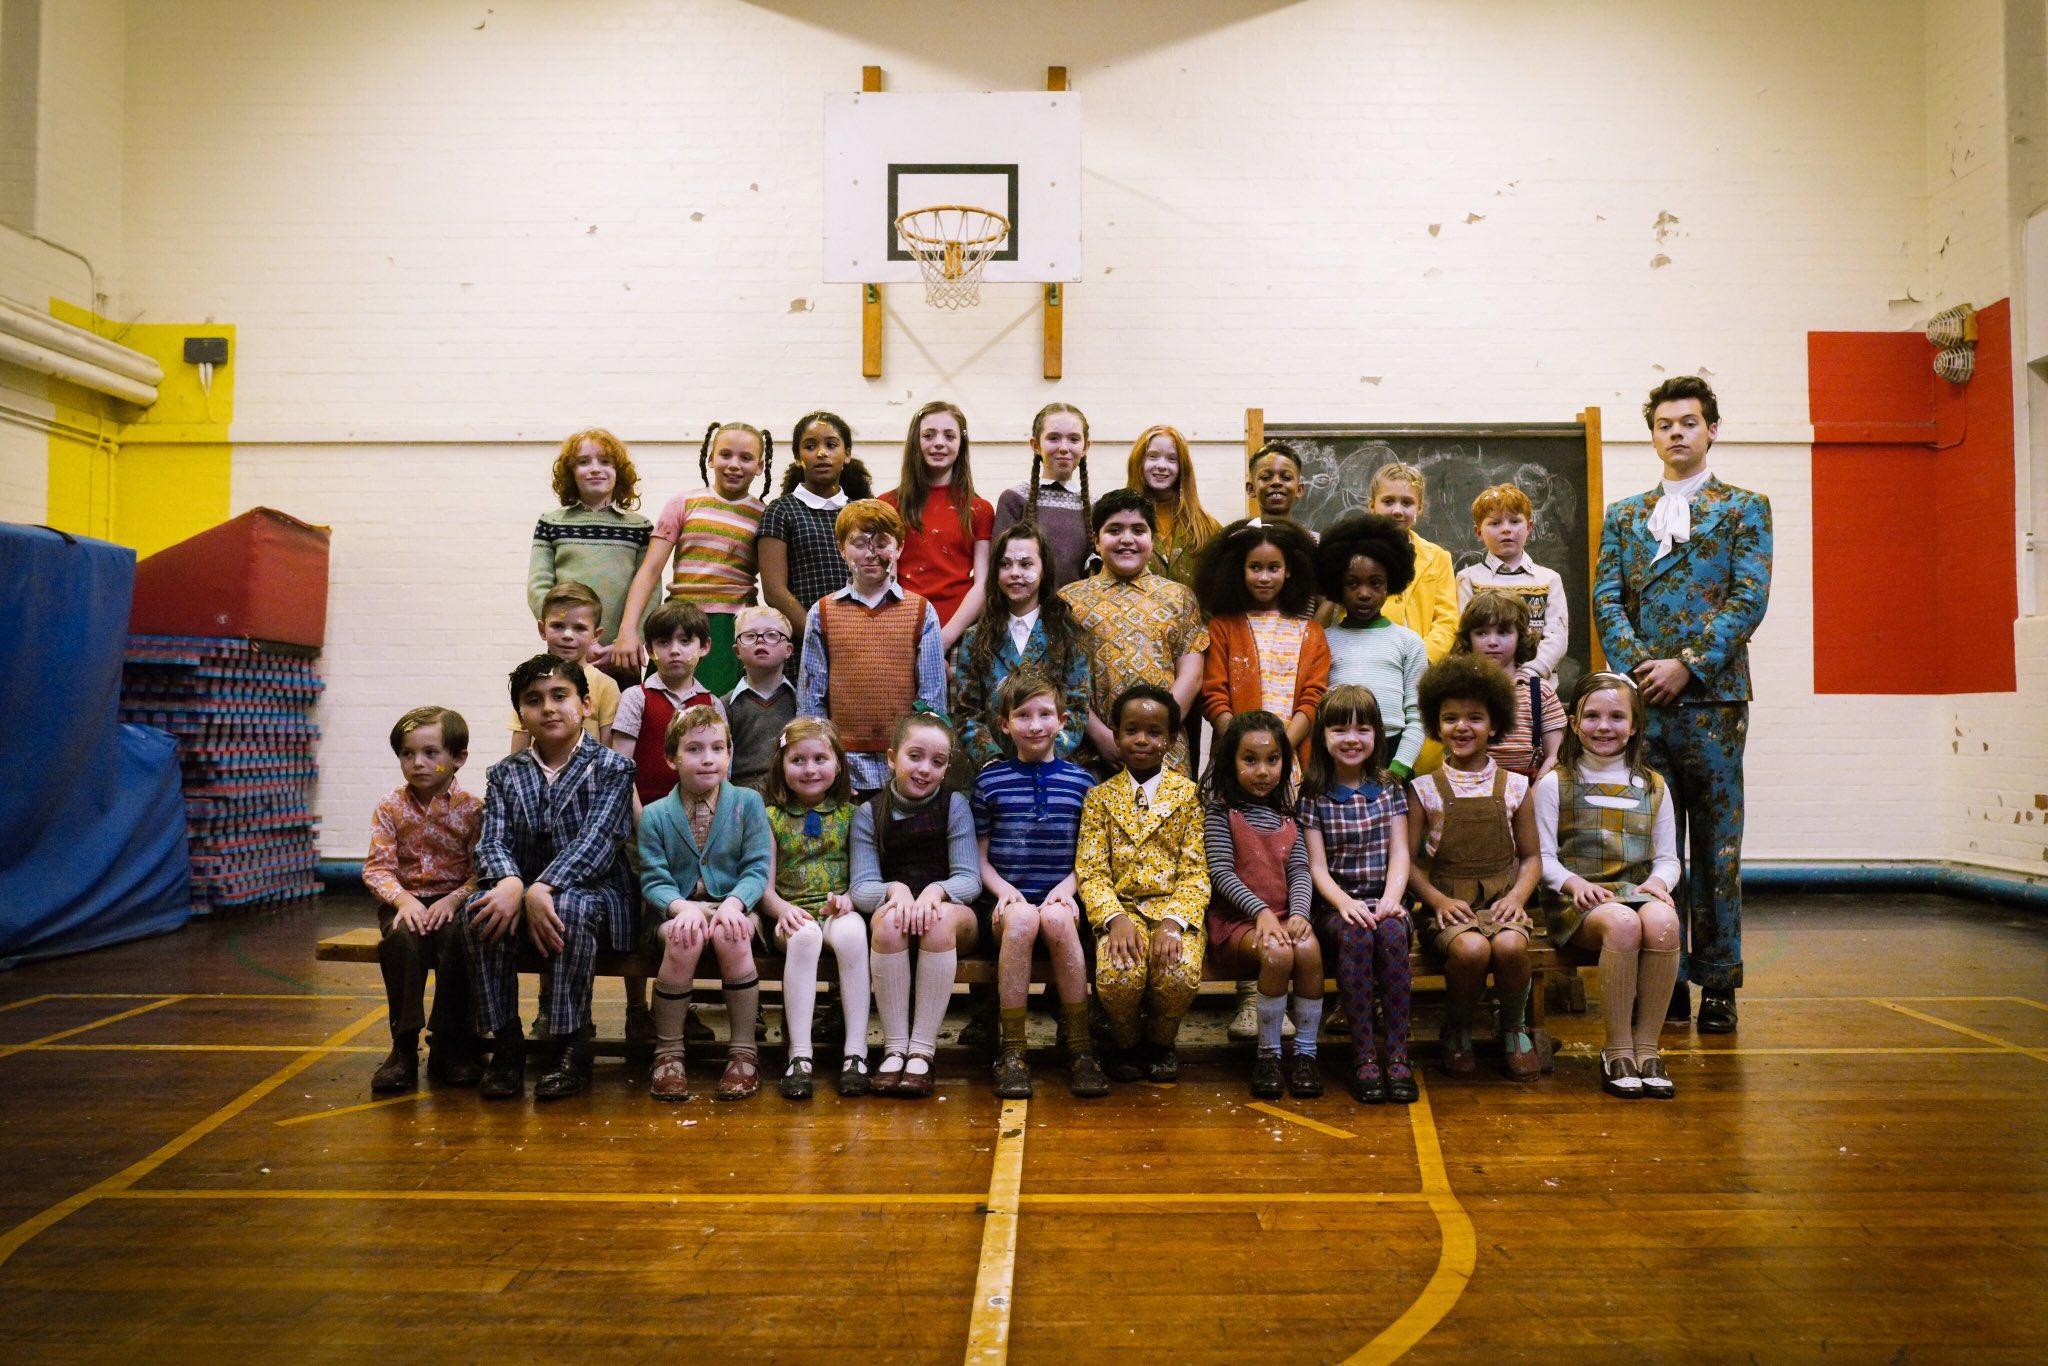 Children! Puppies! Cakes! Harry Styles shares 'Kiwi' video